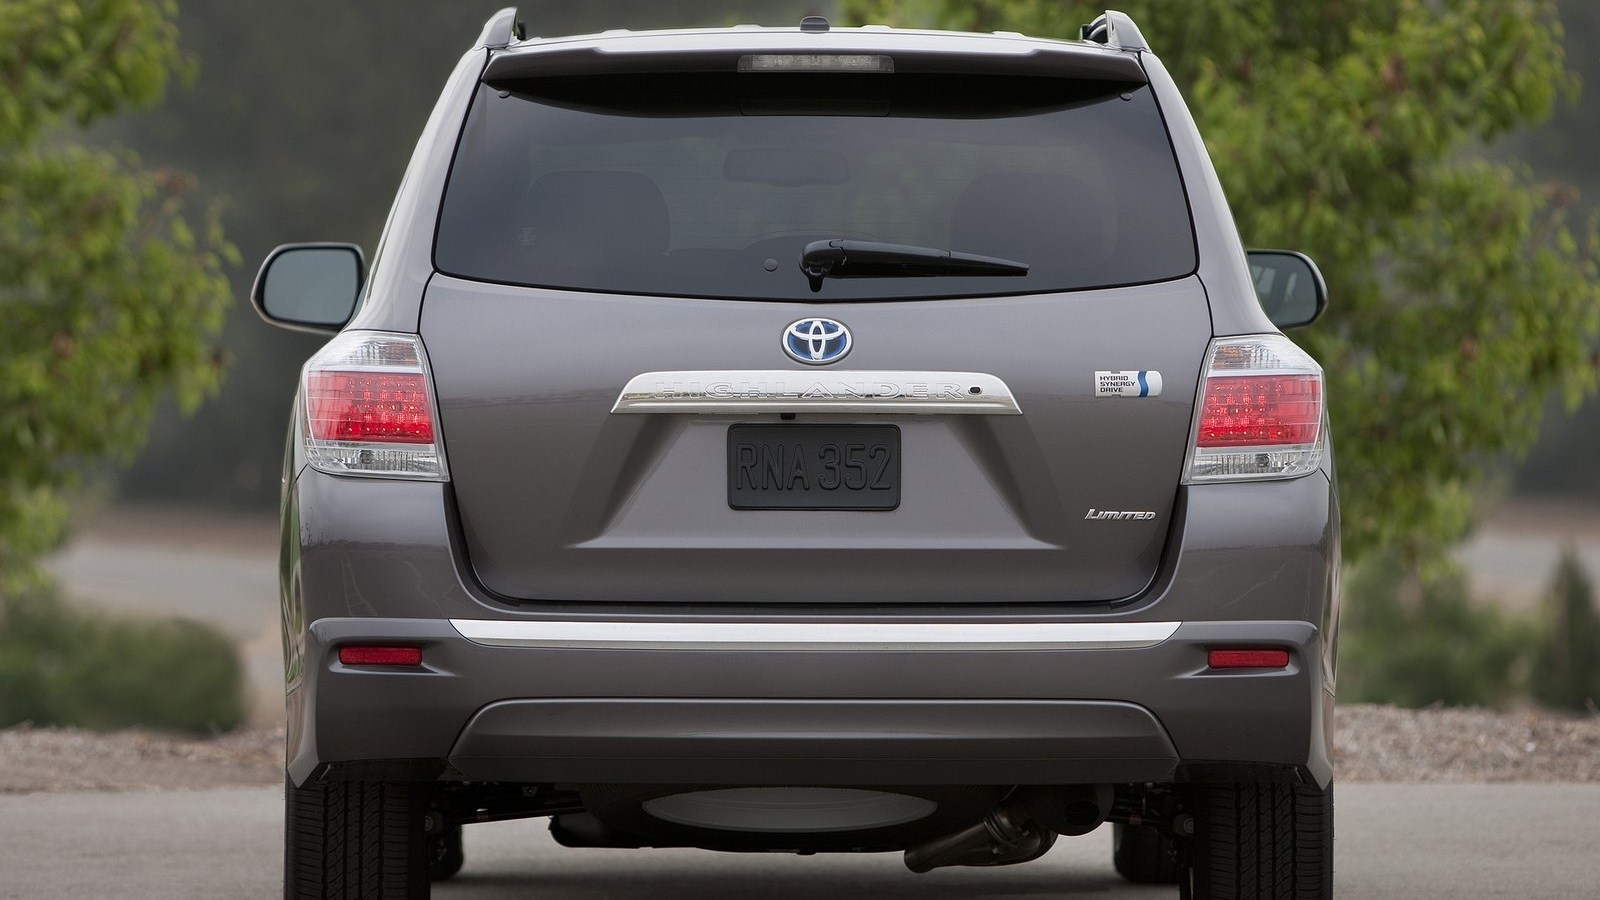 Toyota Kluger-1.bp.blogspot.com